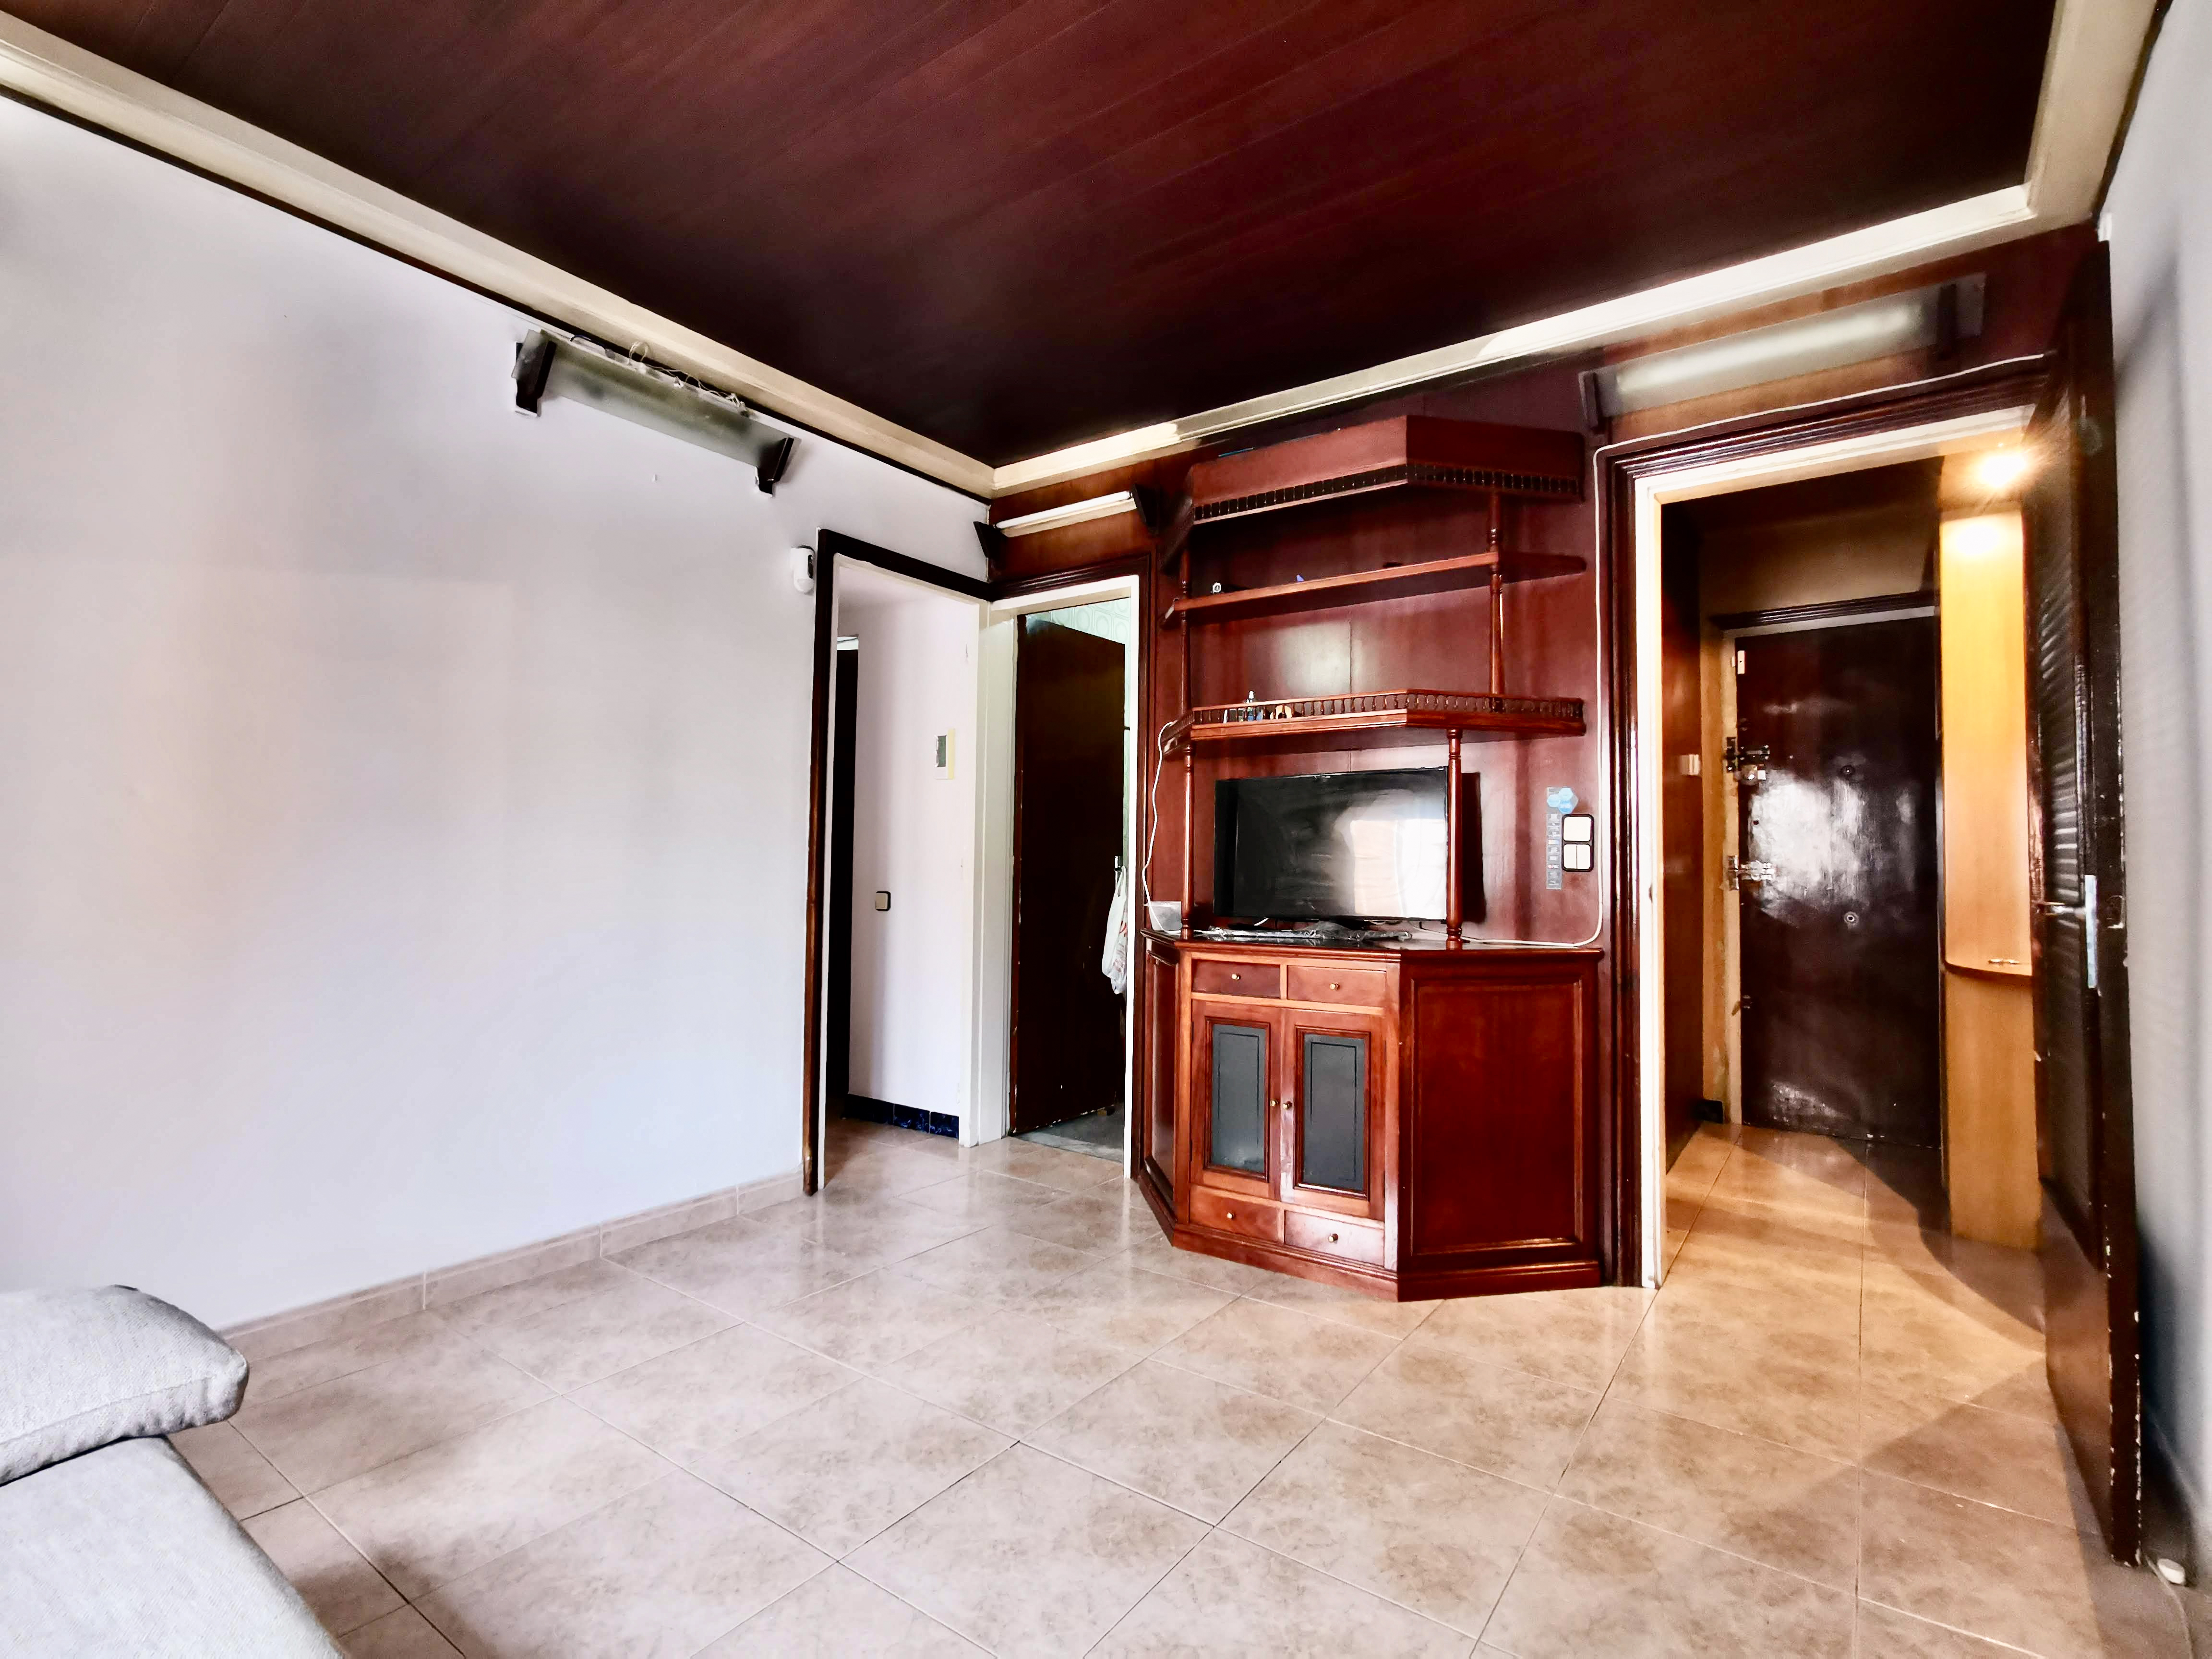 Piso en La florida en L'Hospitalet de llobregat en Venta por 90.000€